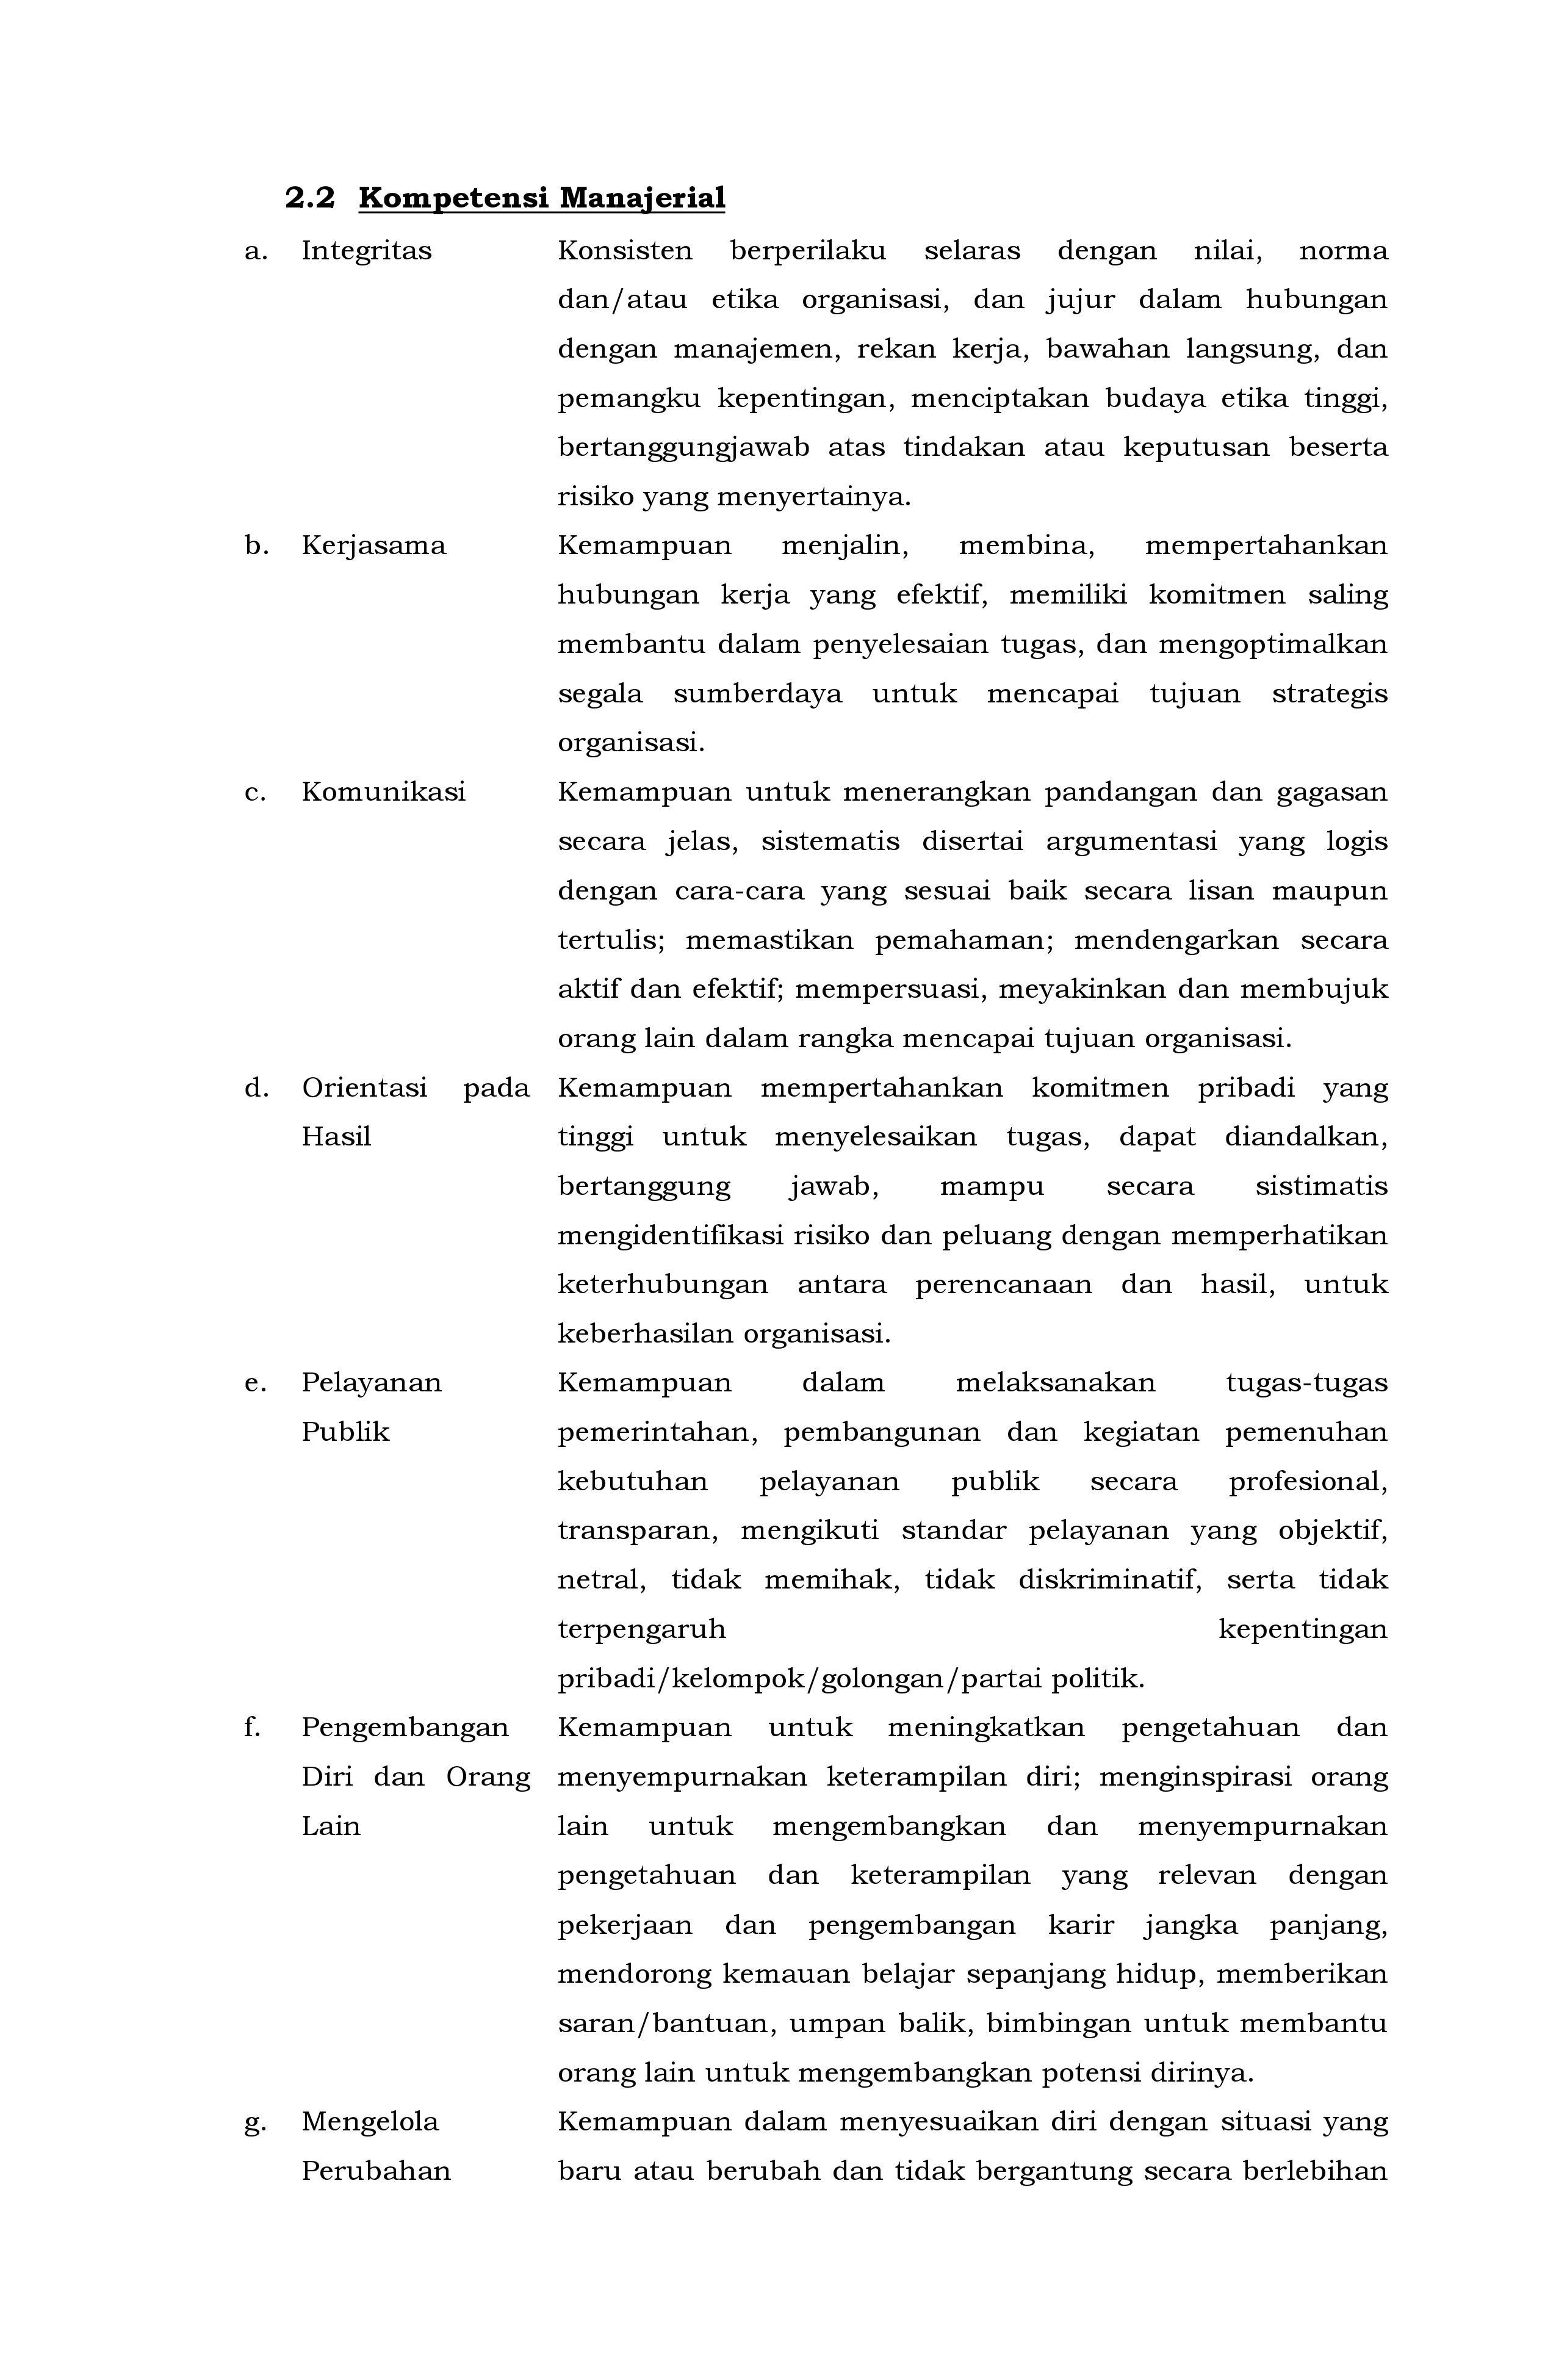 https://bkpsdm.lebongkab.go.id/an-component/media/upload-gambar-pendukung/JPT/0004.jpg